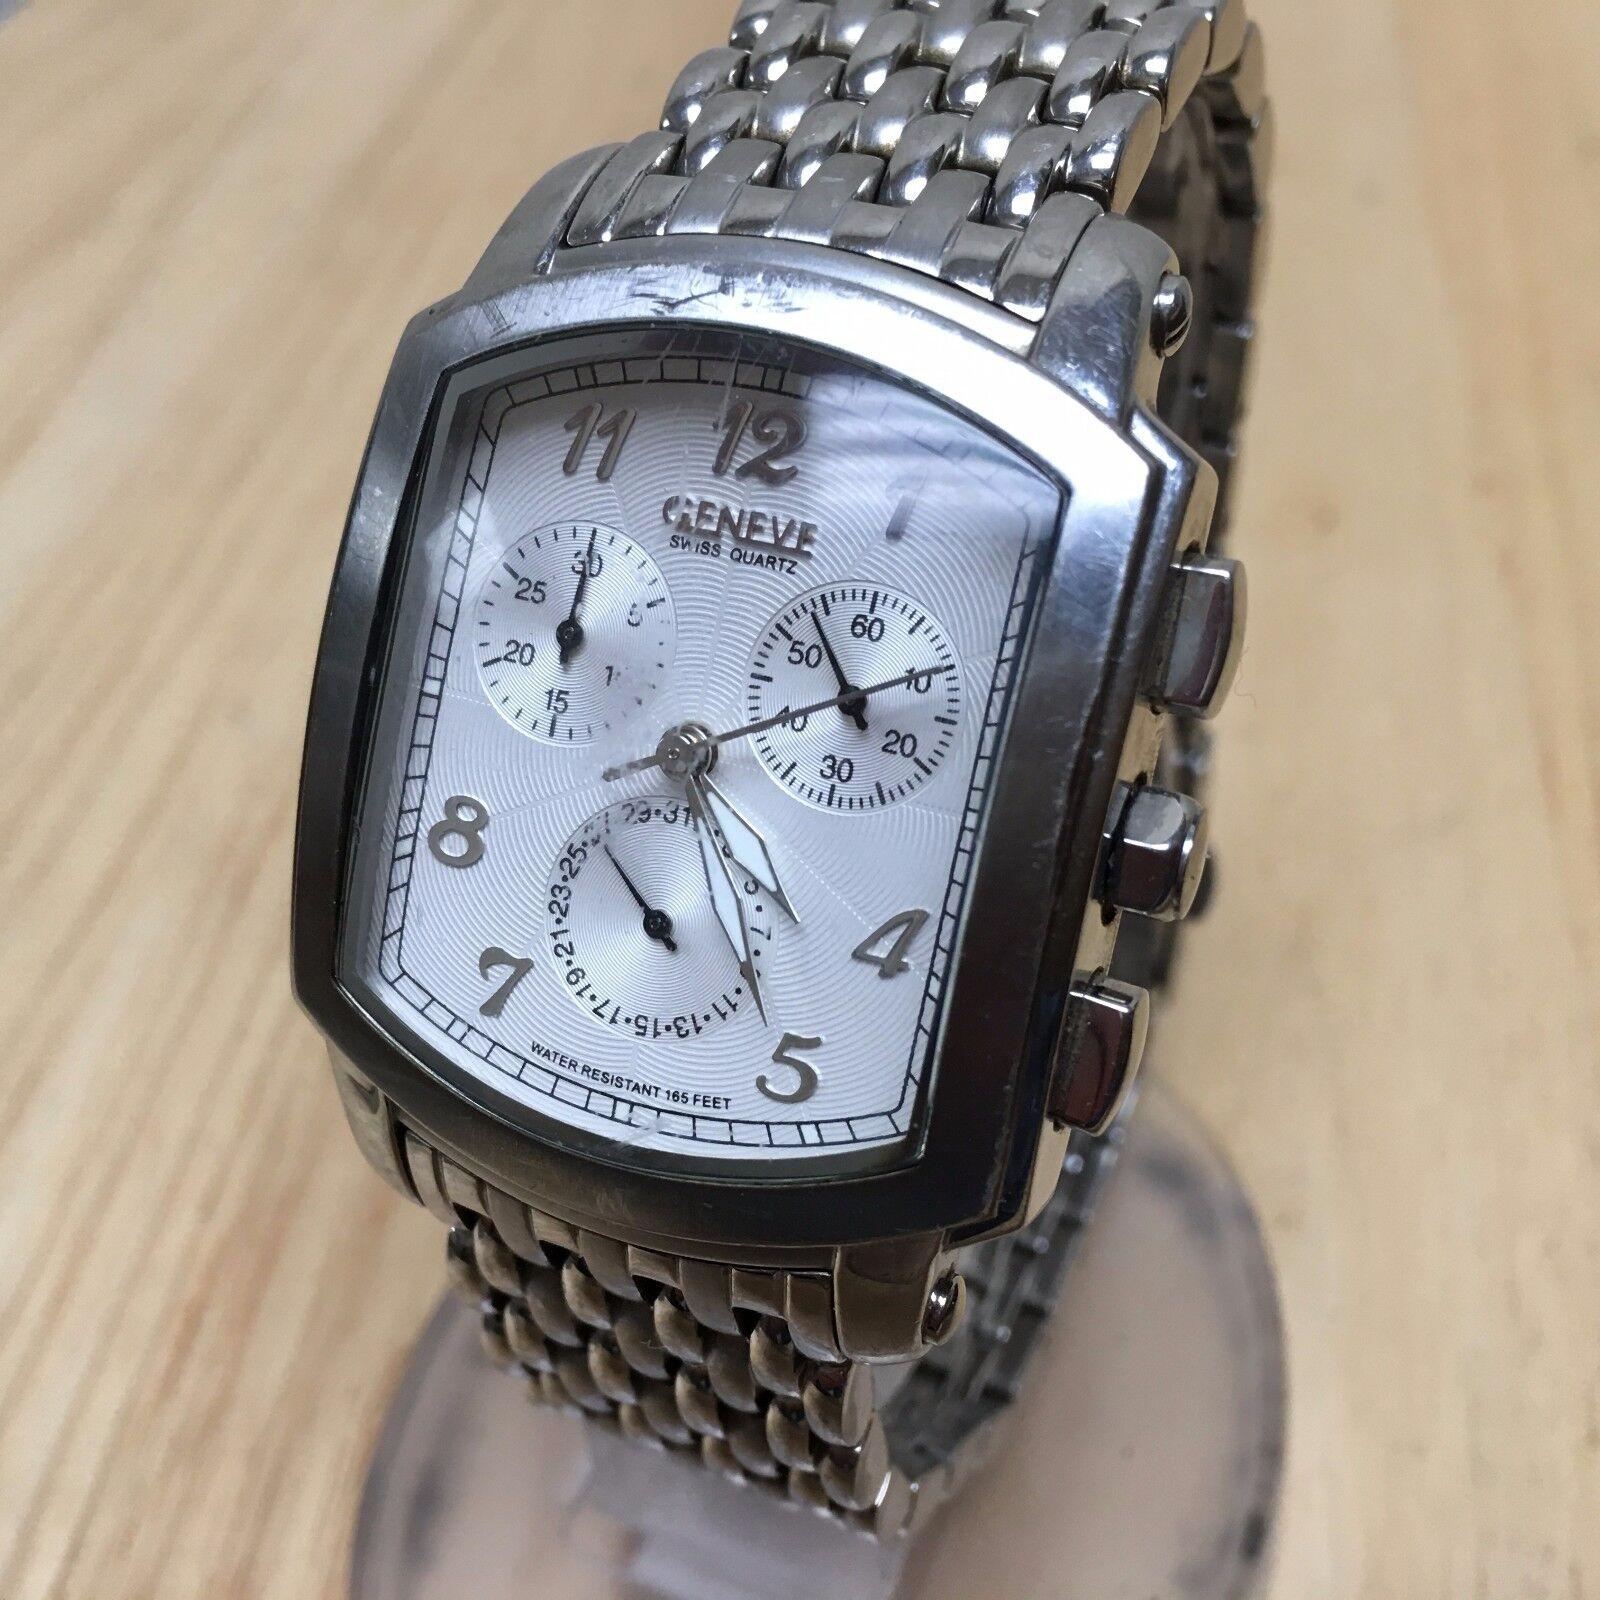 $62.99 - Luxury Geneve Swiss Mens All Steel Analog Quartz Chrono Watch Hours~New Battery